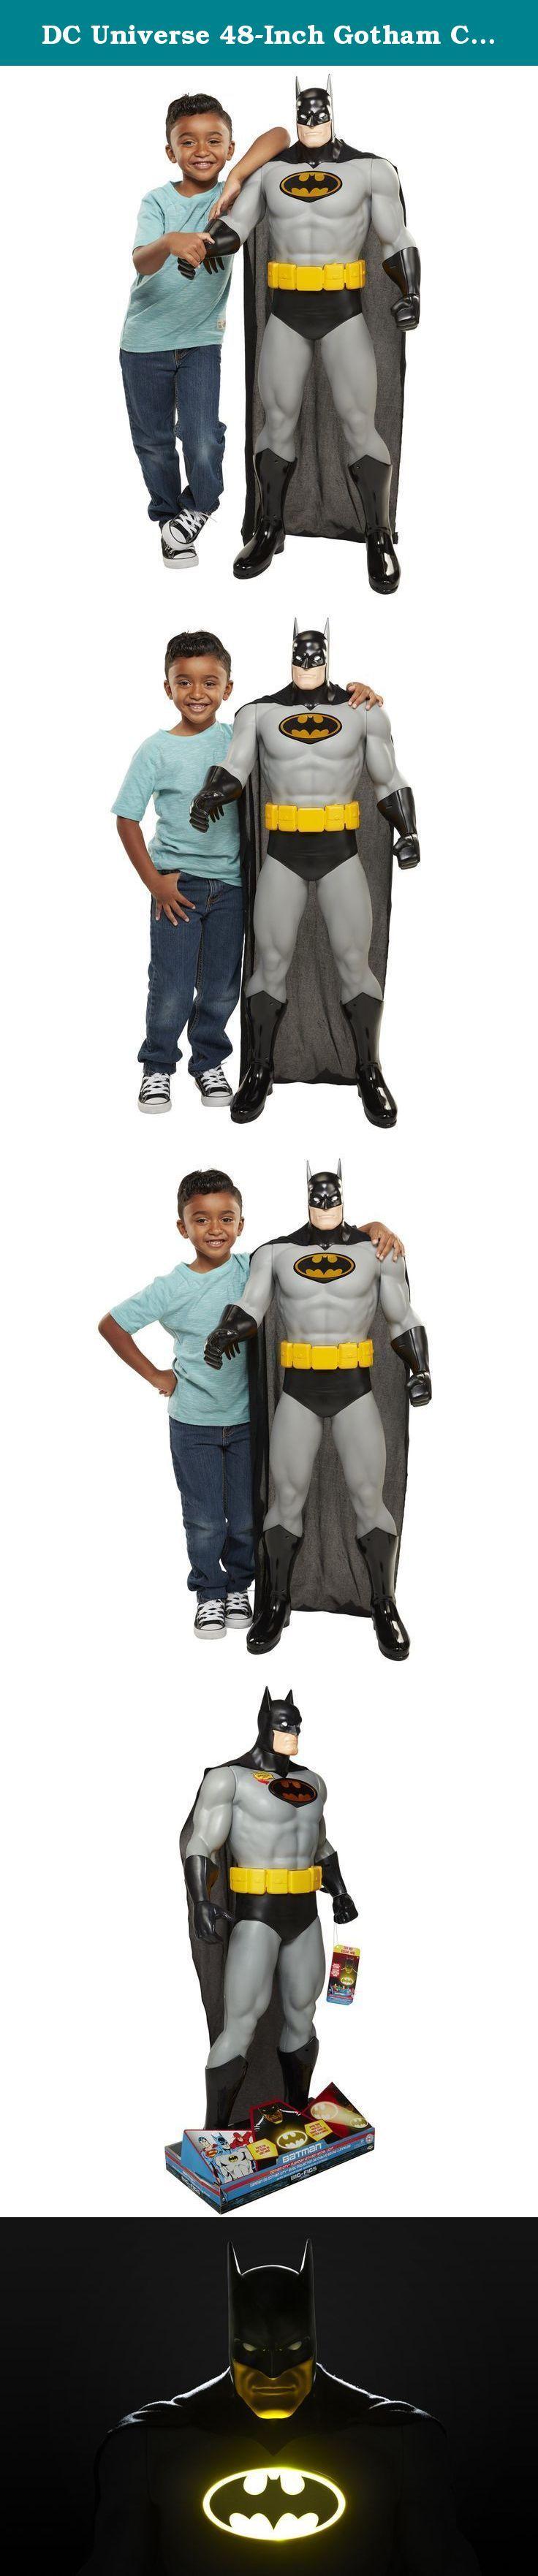 17 Best Ideas About Bat Signal On Pinterest Batman